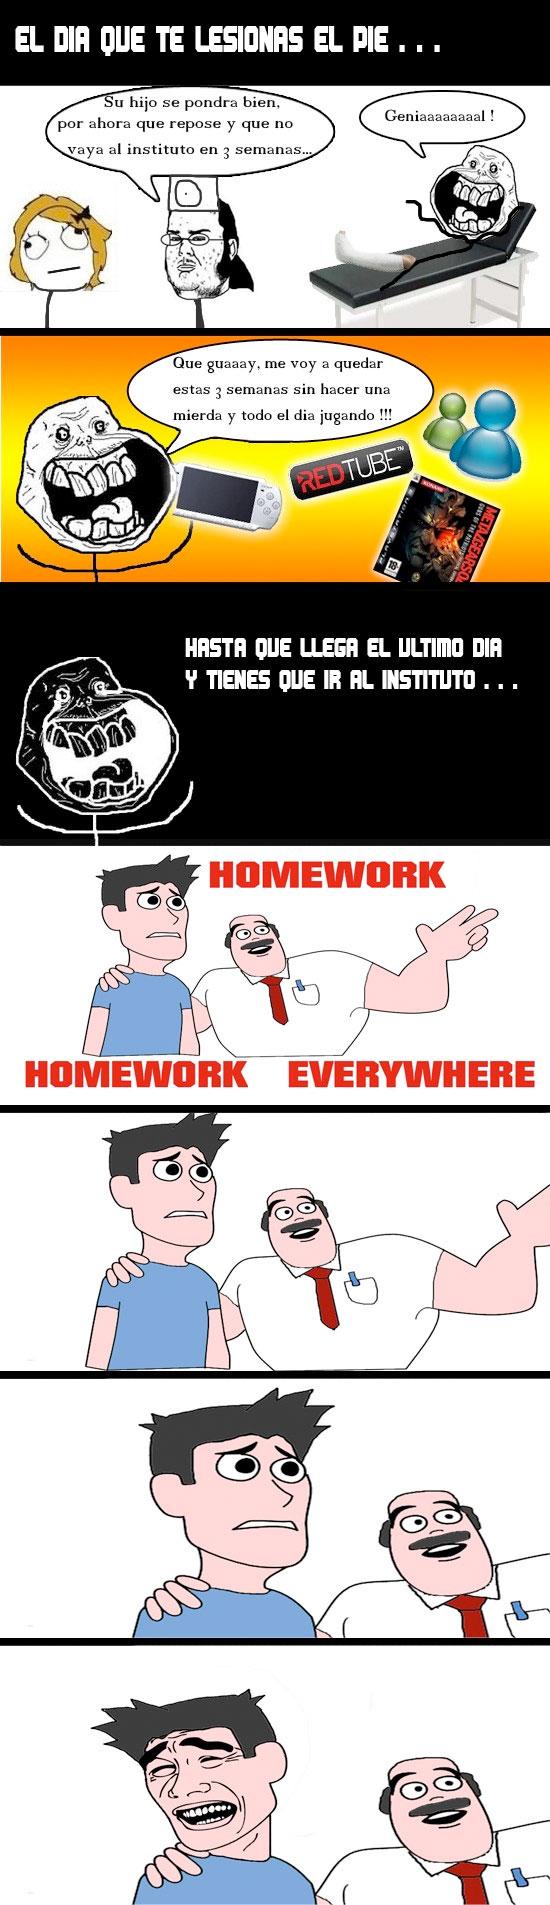 clase,colegio,deberes,everywhere,homework